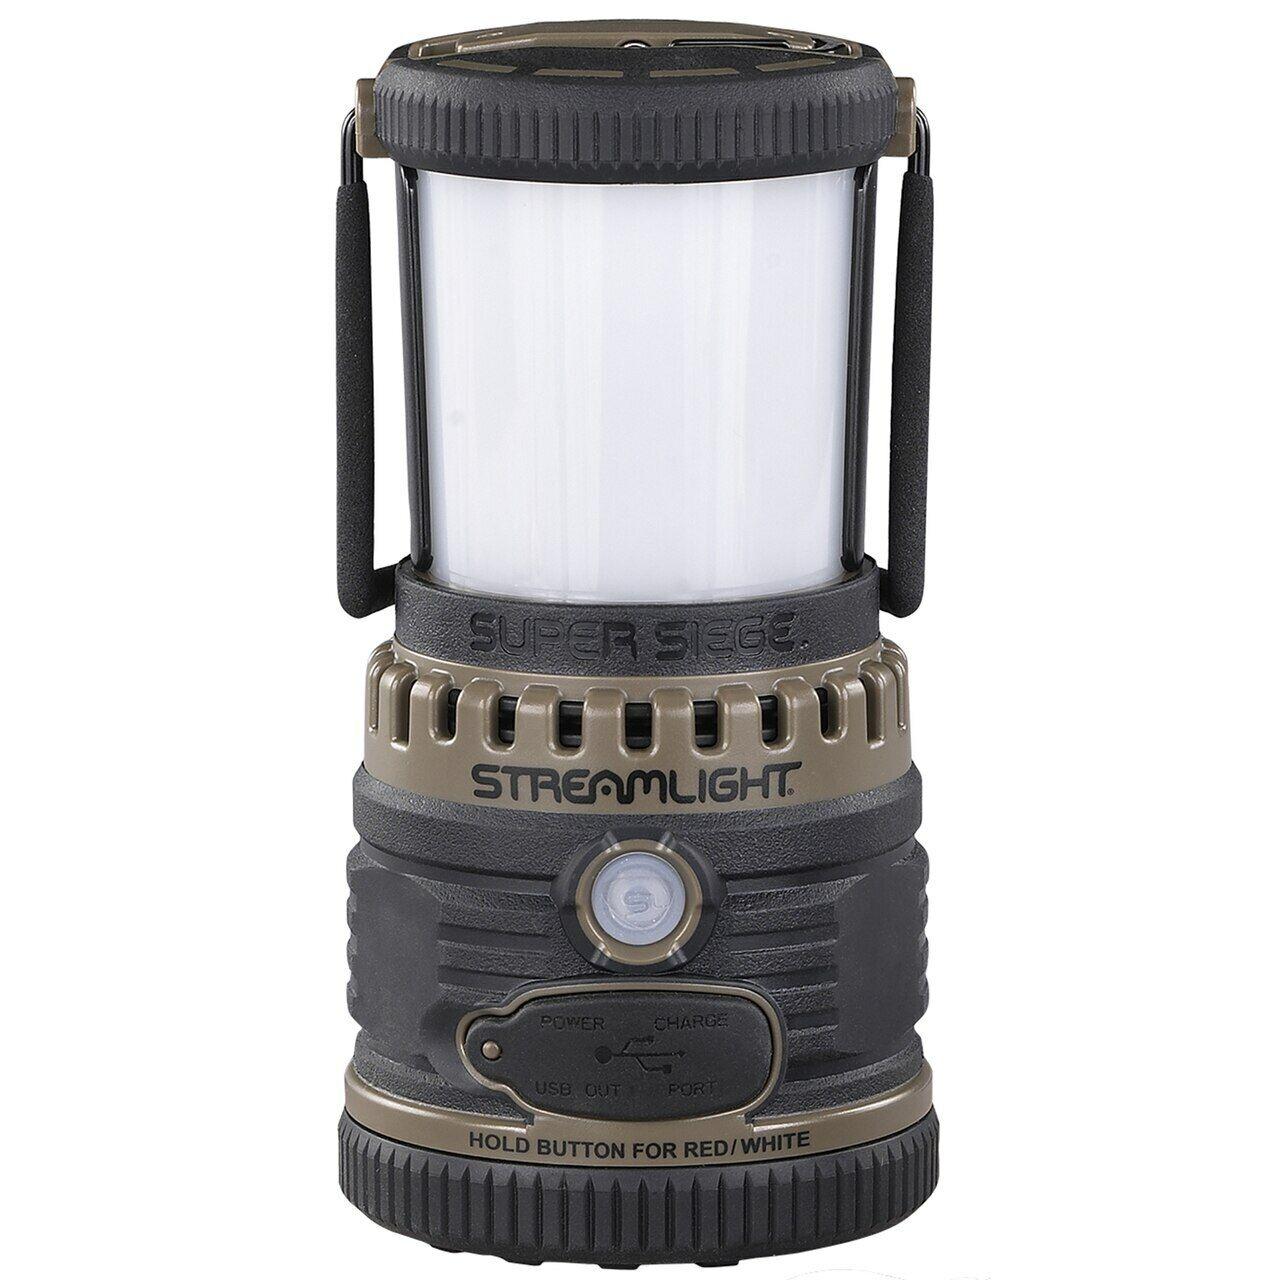 Streamlight Siege Series Lantern -Coyote - 44947